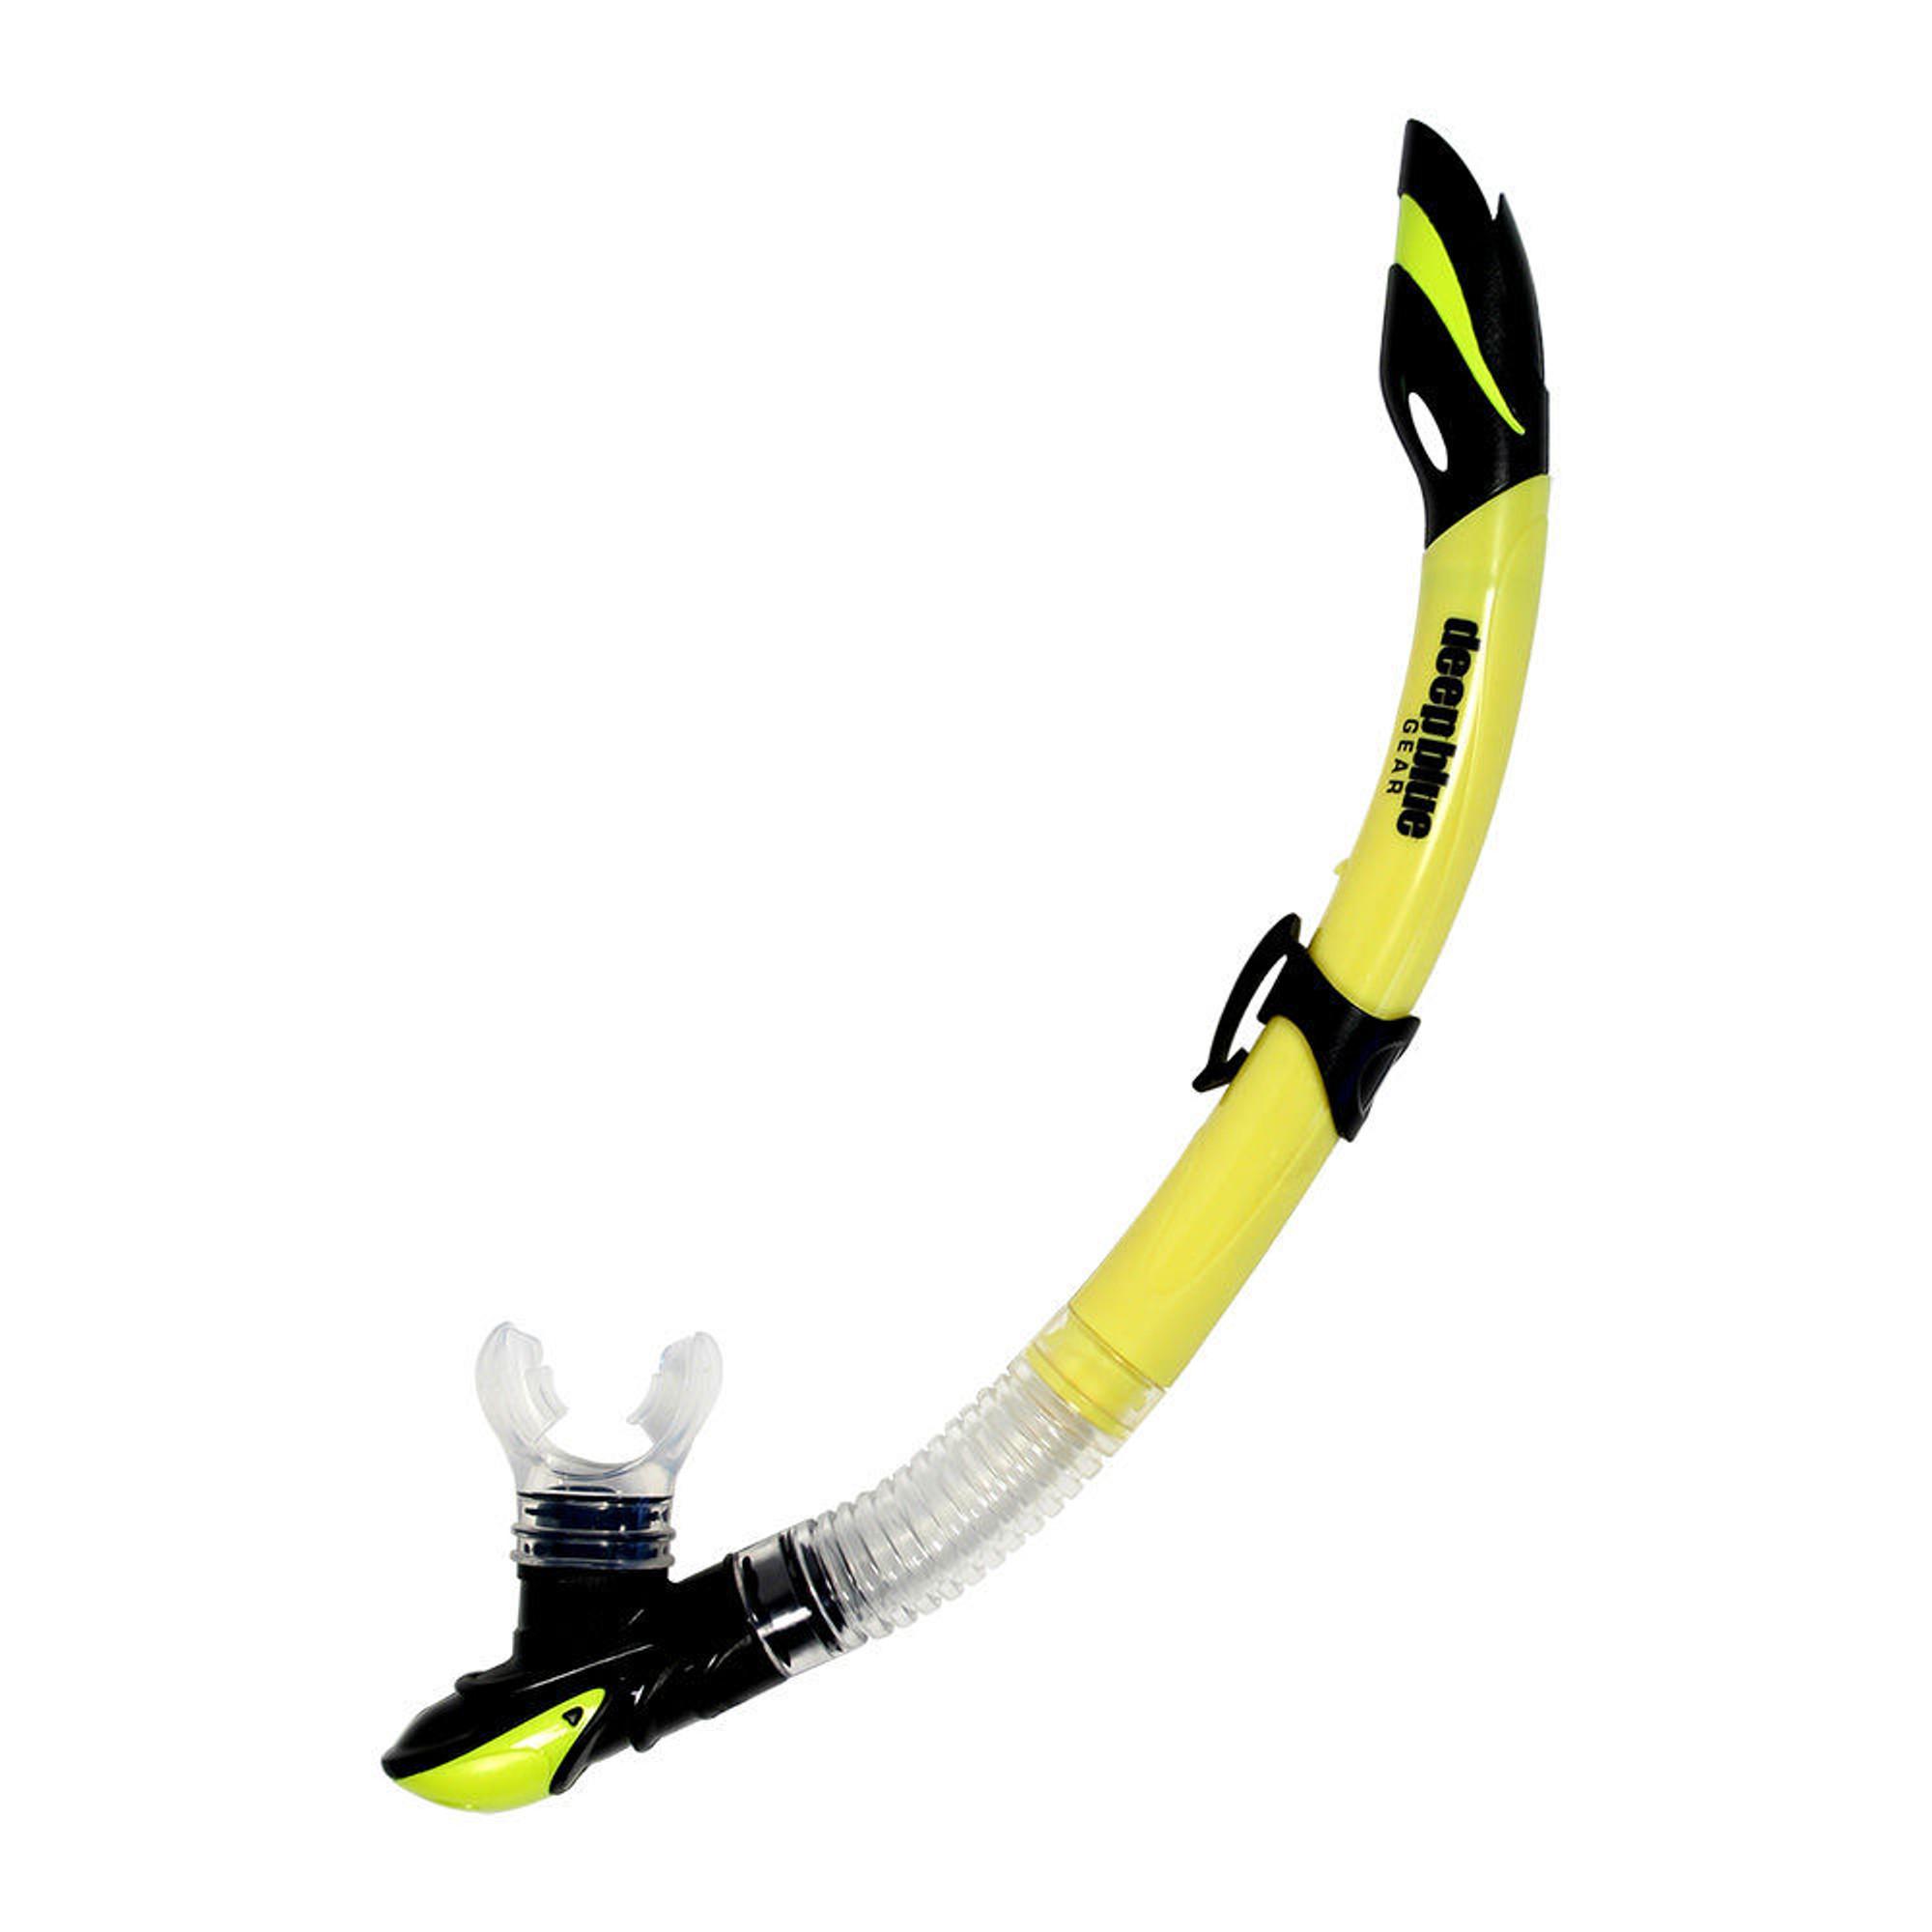 Maui 2 Junior - Kid's Semi-Dry Snorkel